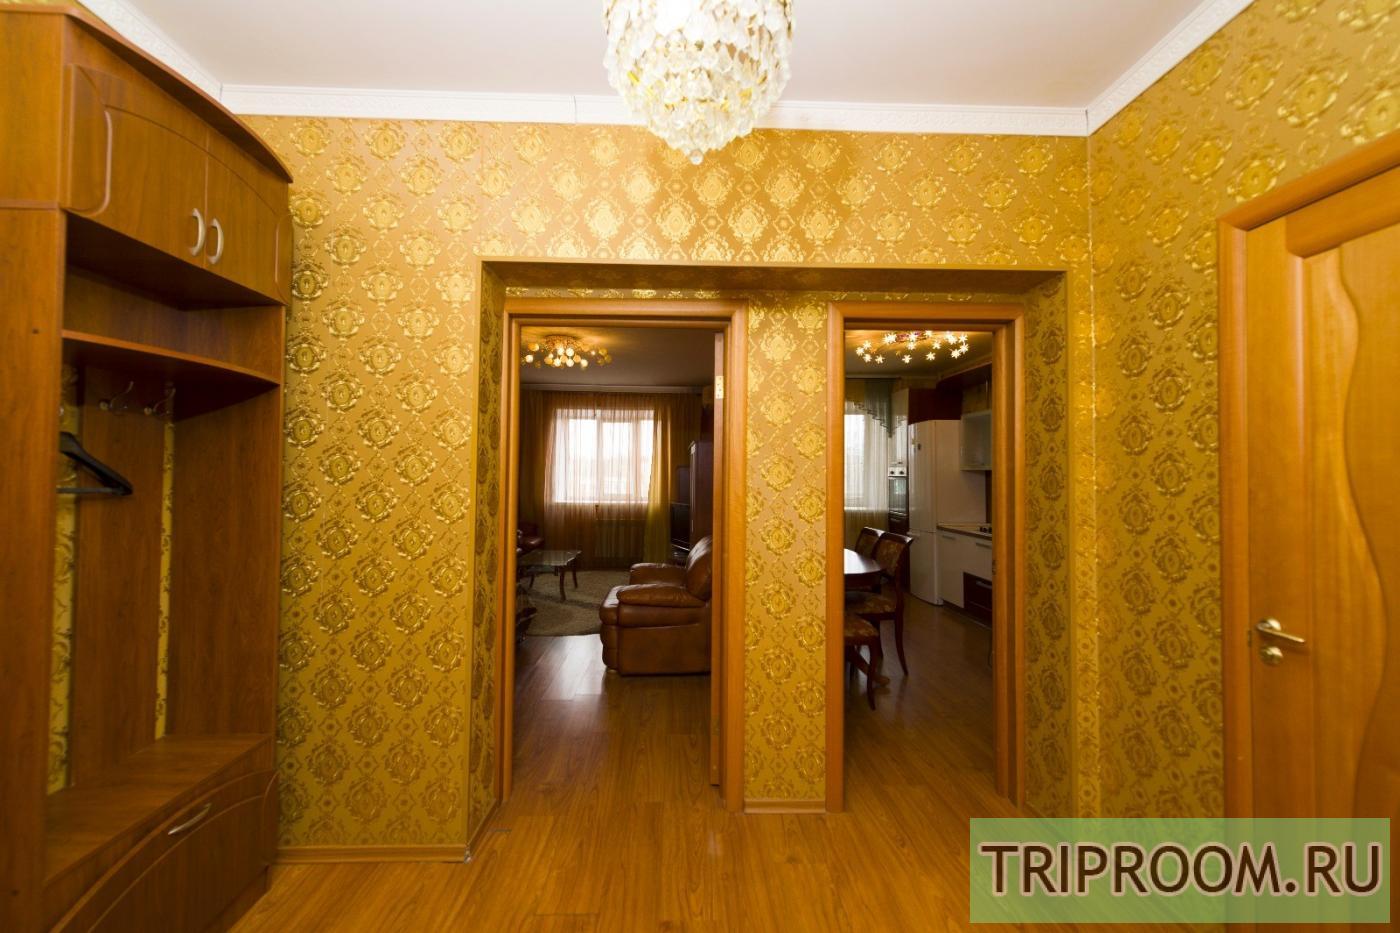 2-комнатная квартира посуточно (вариант № 2850), ул. Габдуллы Тукая улица, фото № 6